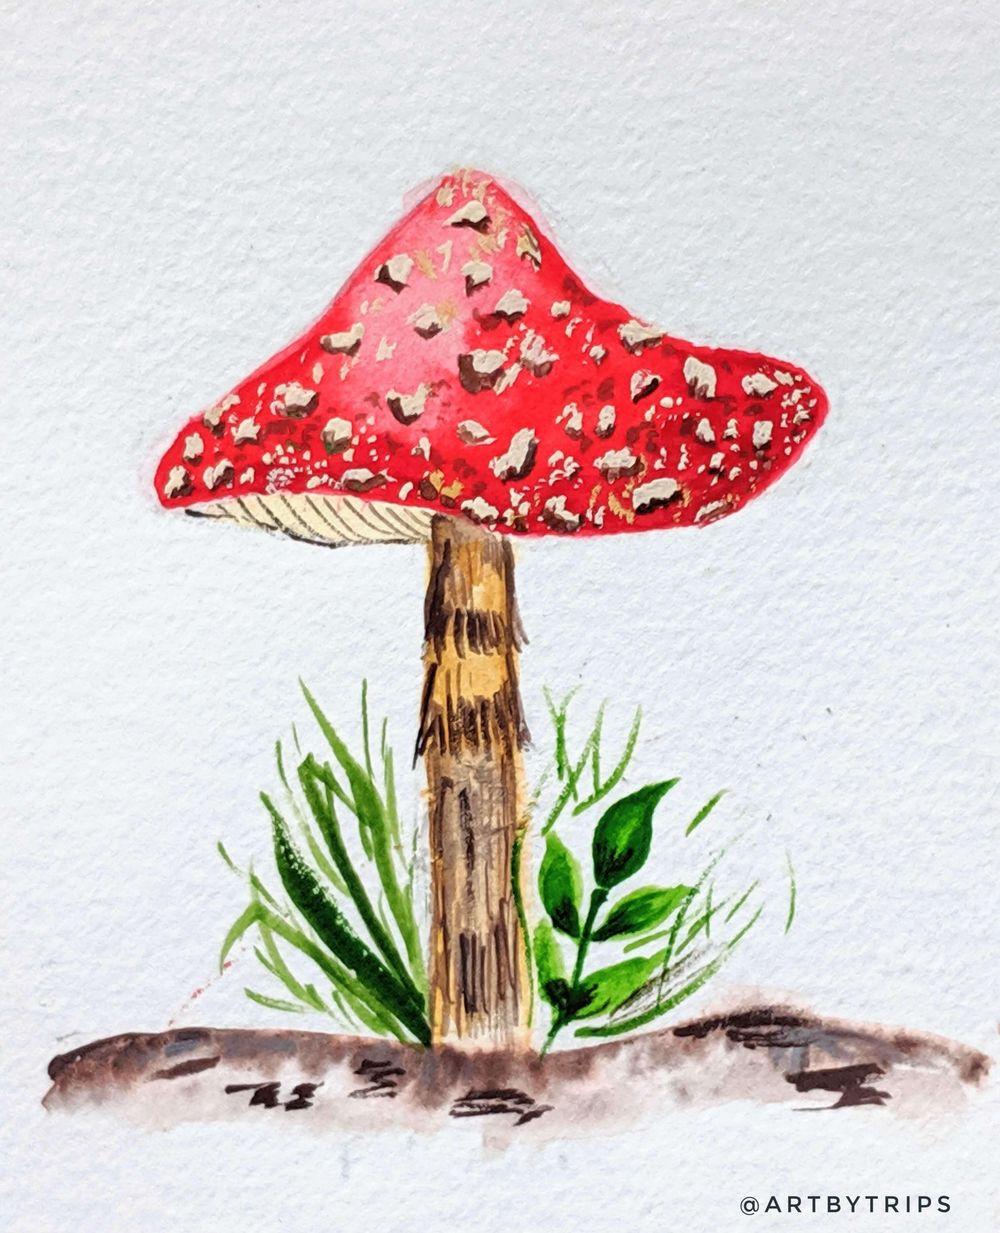 Love Mushrooms :-) - image 4 - student project